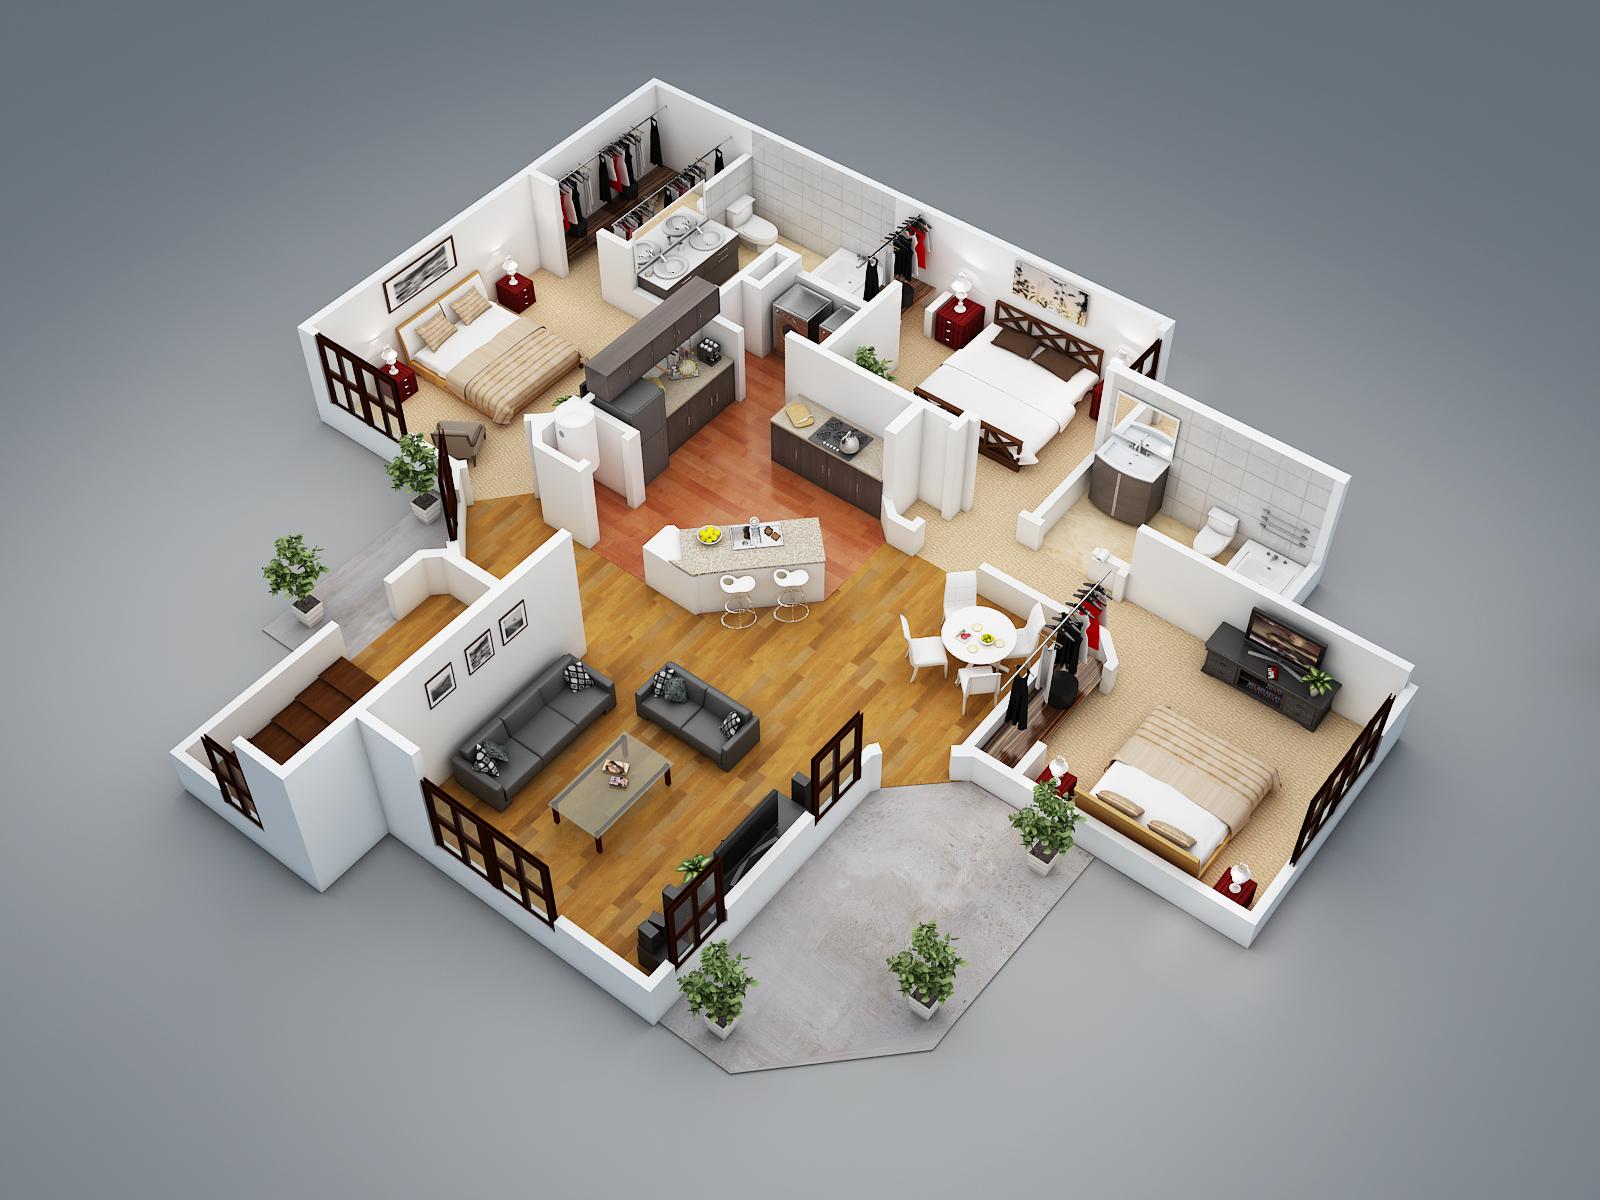 floor plan 3d download plan home plans ideas picture 3d floor plan free download trend home design and decor